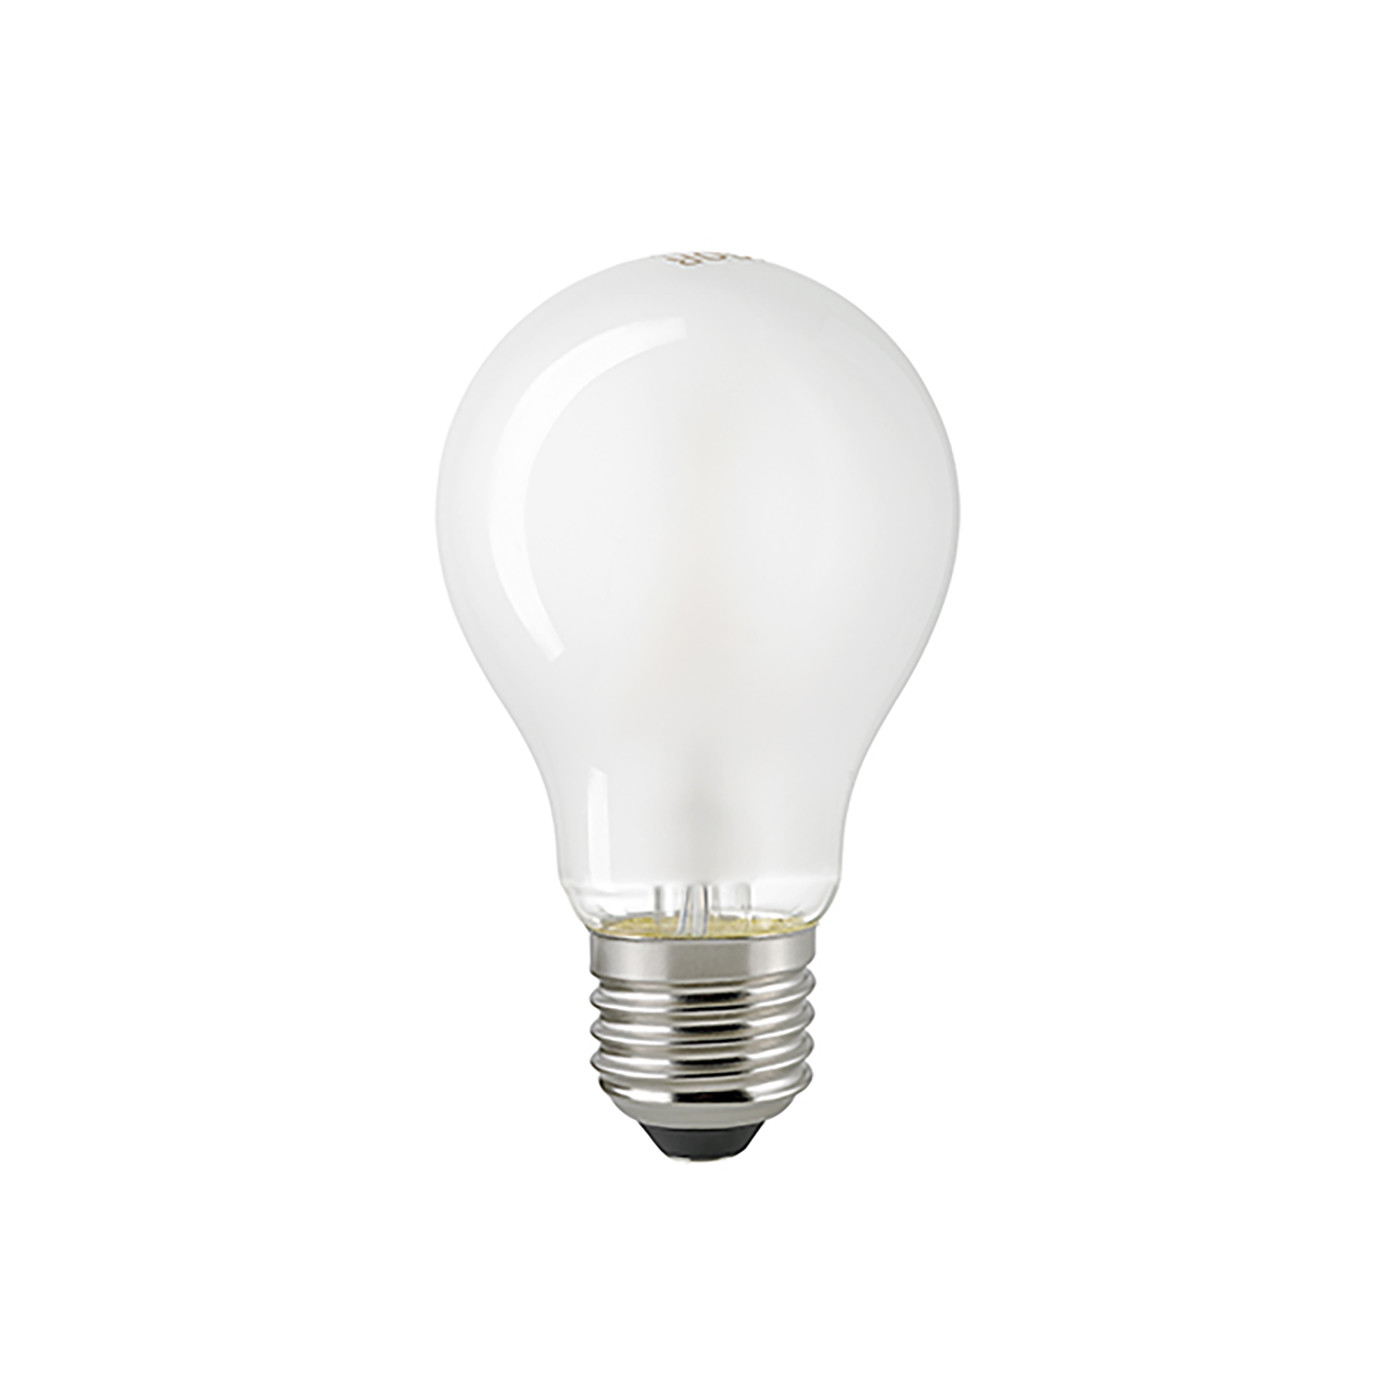 Sigor LED-Filament-Standardlampe A60 8,5W 2700K 230V E27 matt